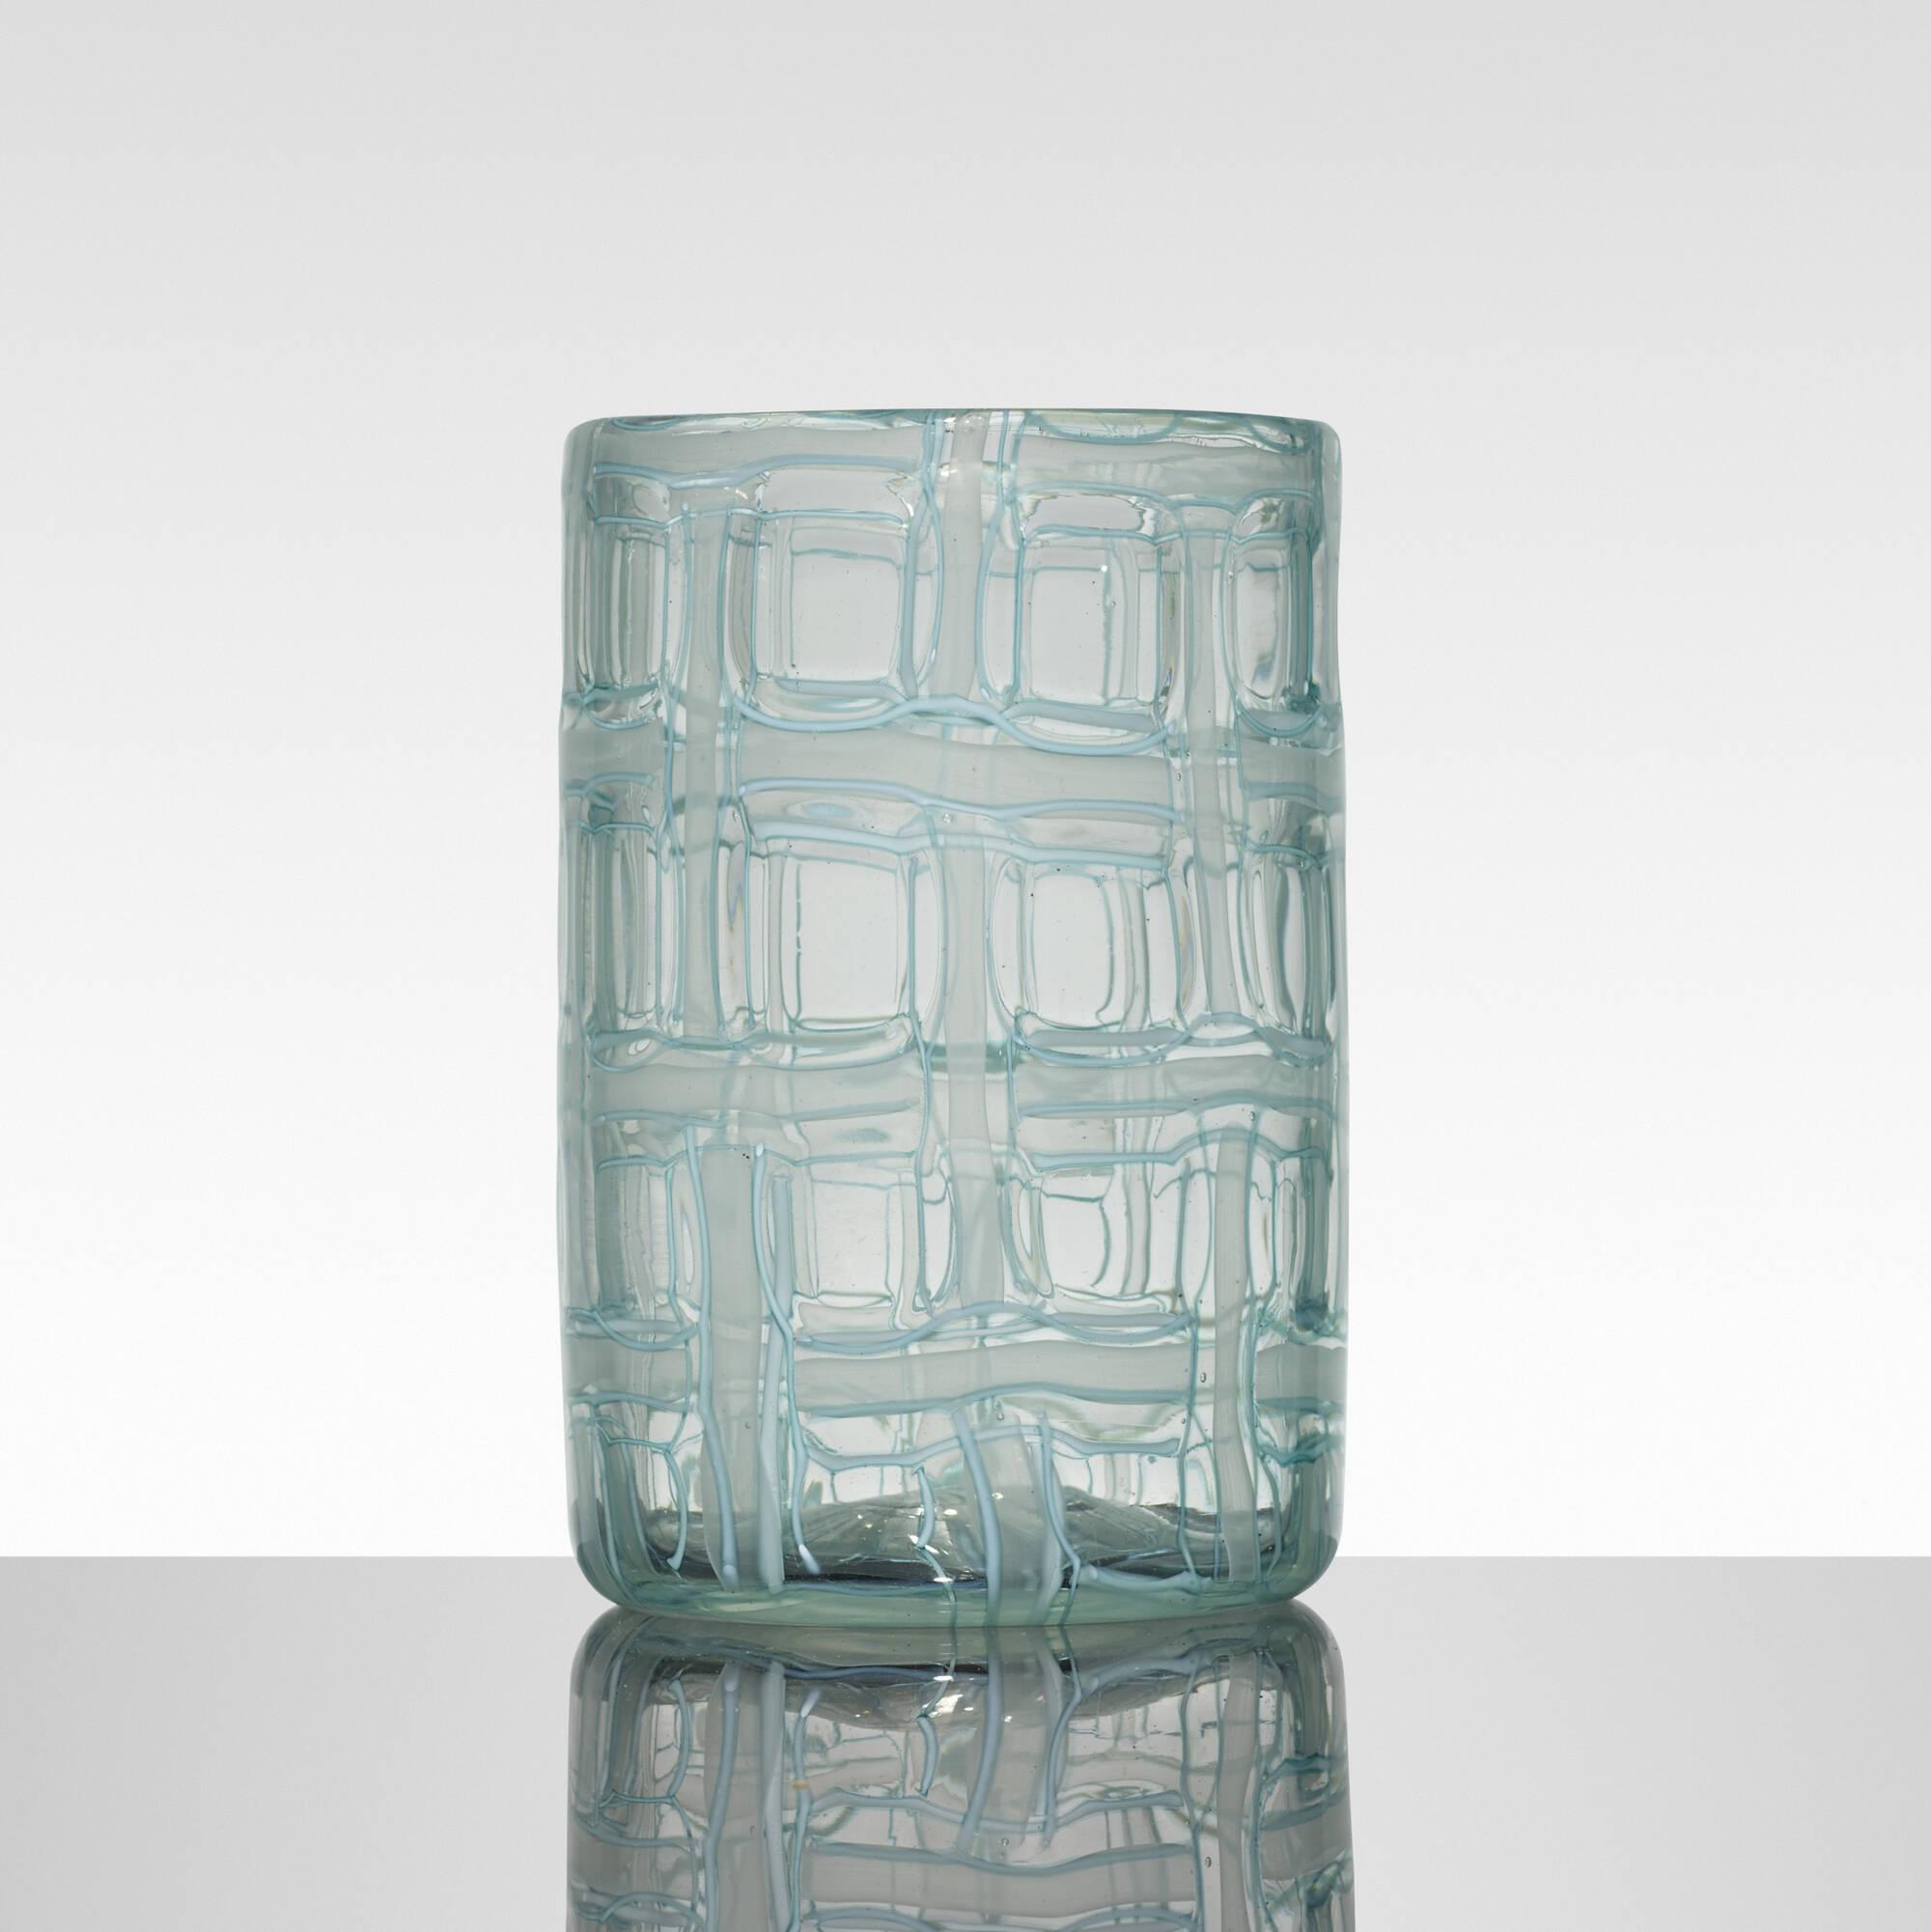 175: Ercole Barovier / Argo vase (1 of 3)